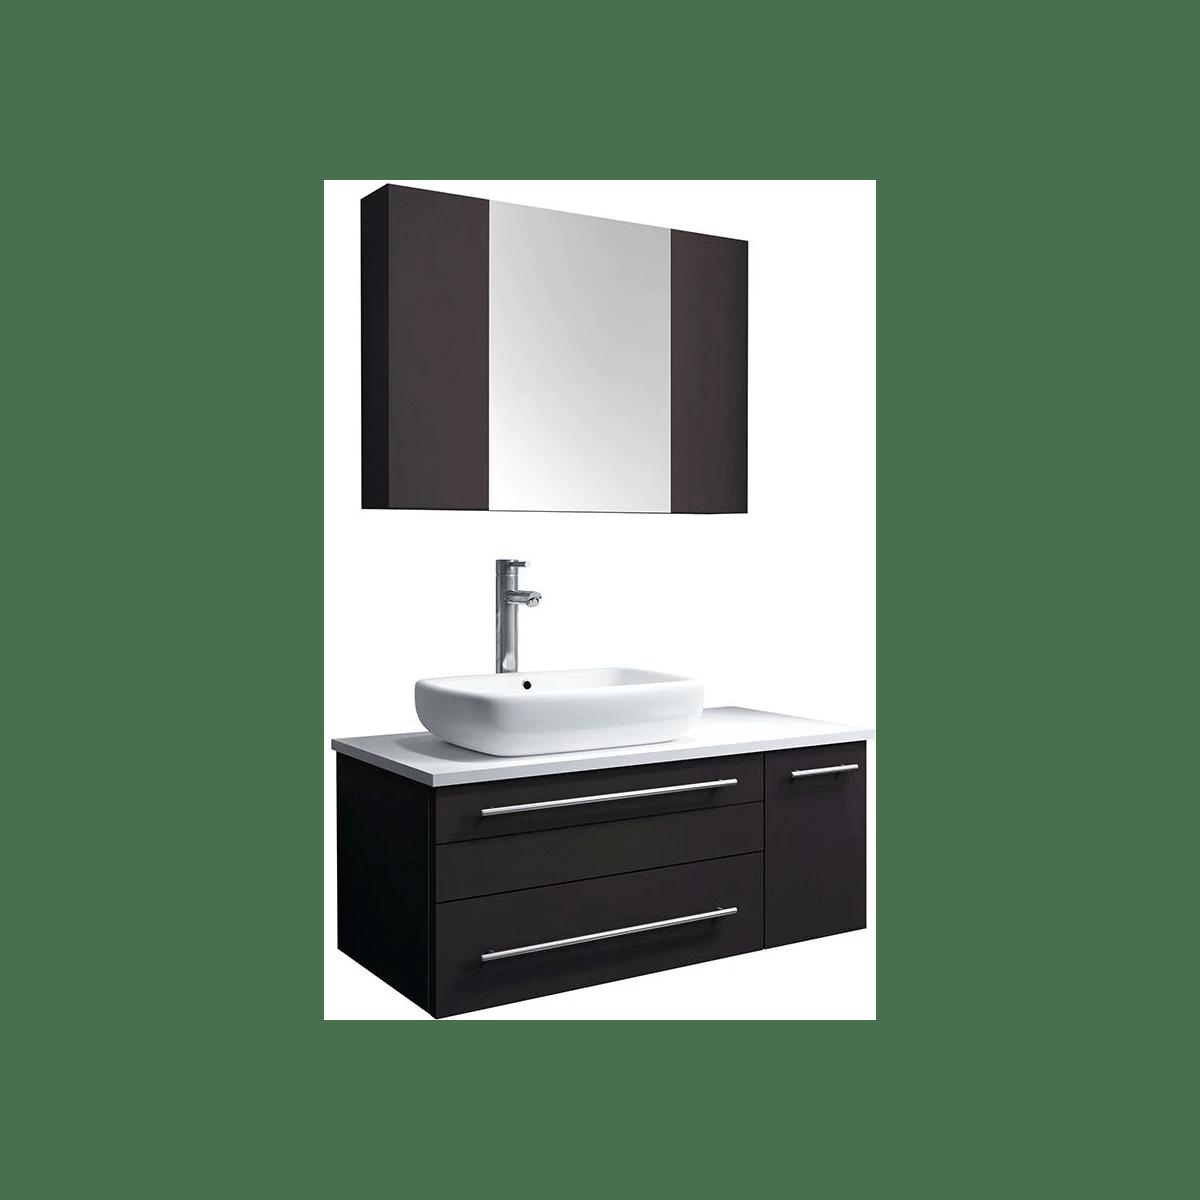 Fresca Fvn6136es Vsl L Espresso Stella 36 Wall Mounted Single Right Basin Vanity Set With Wood Cabinet Quartz Vanity Top Medicine Cabinet Faucet And Frameless Mirror Faucet Com